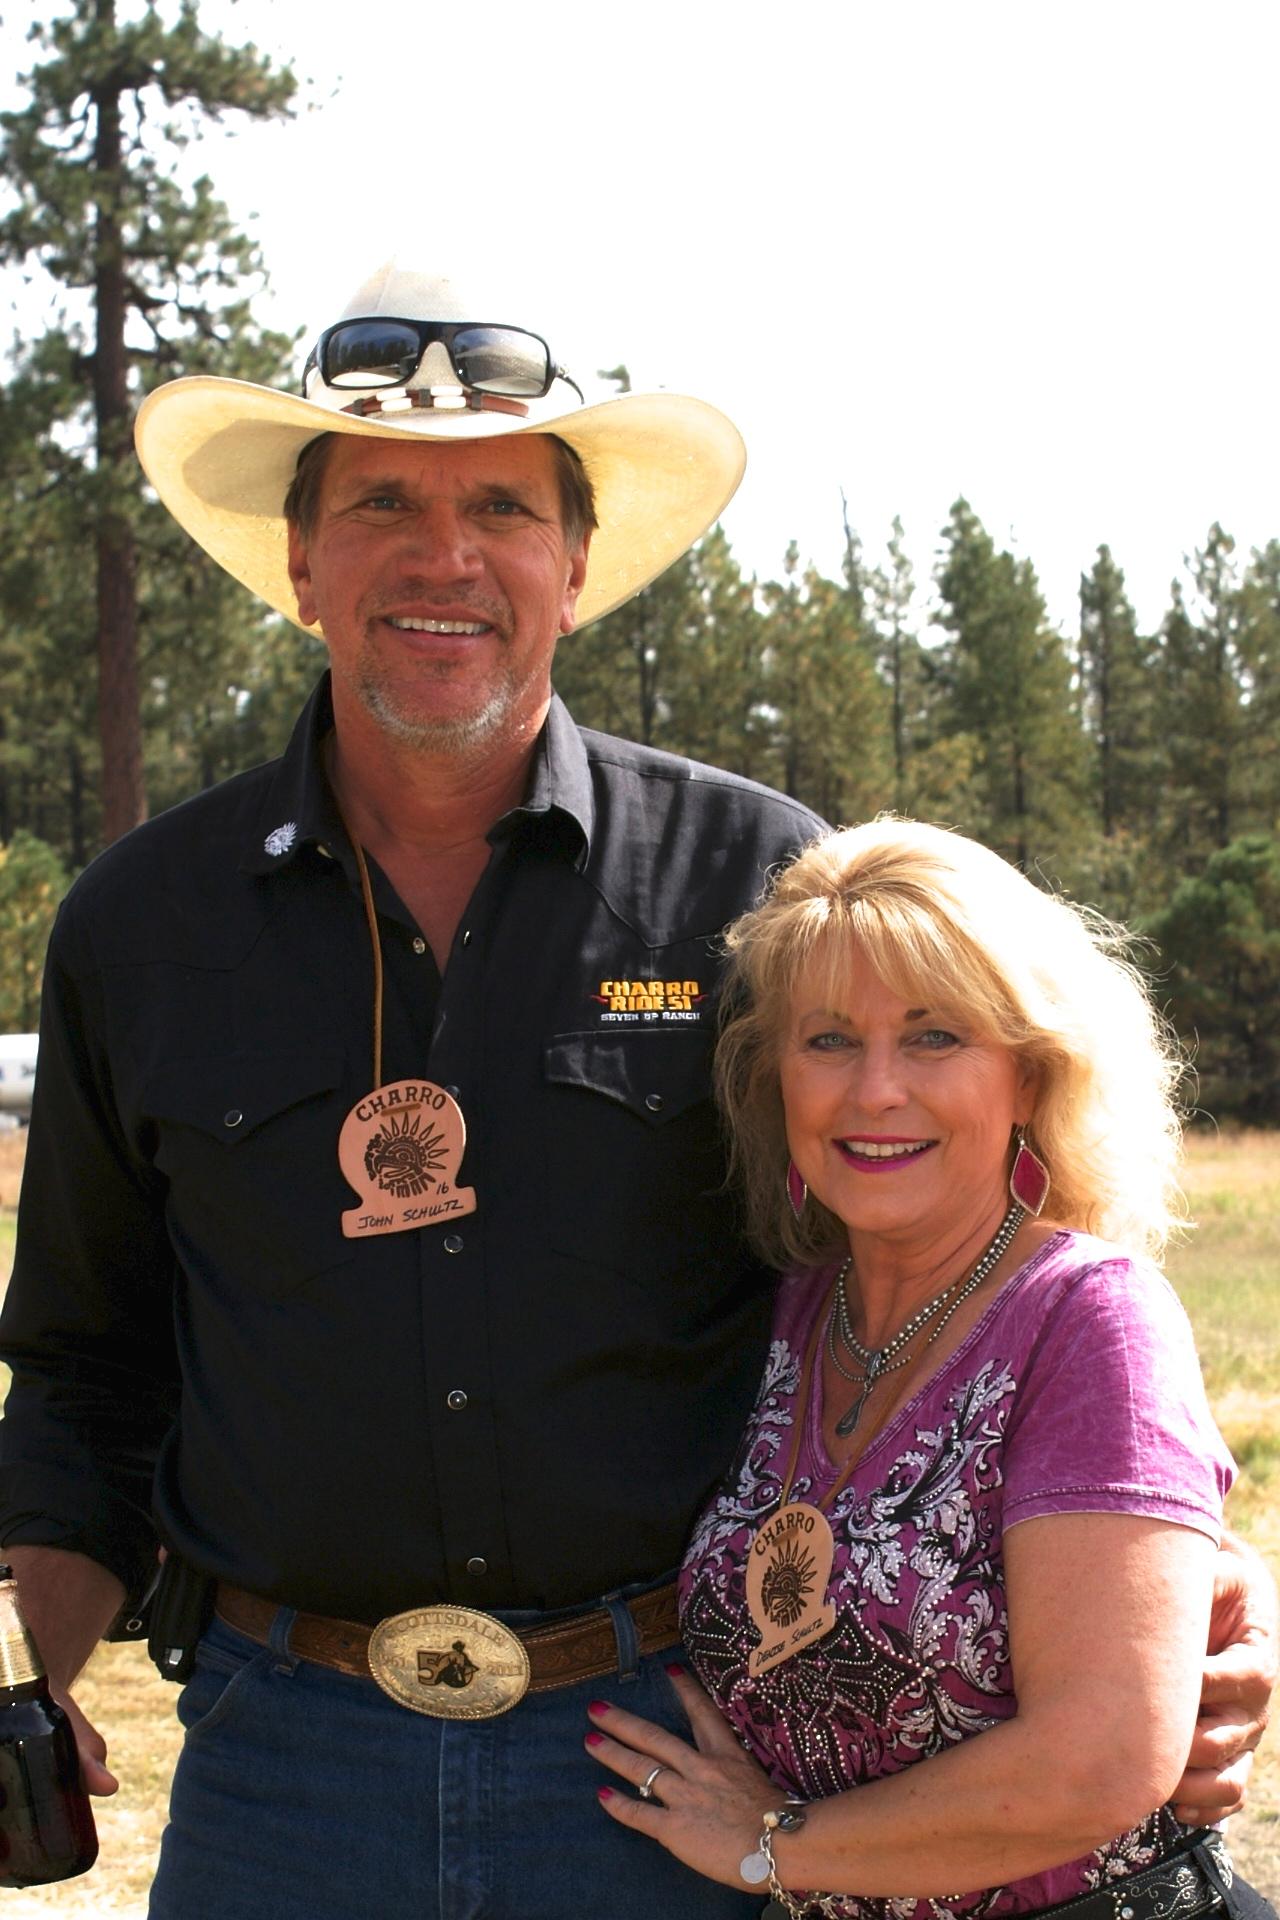 John and Denise Schultz on the Charro Ride